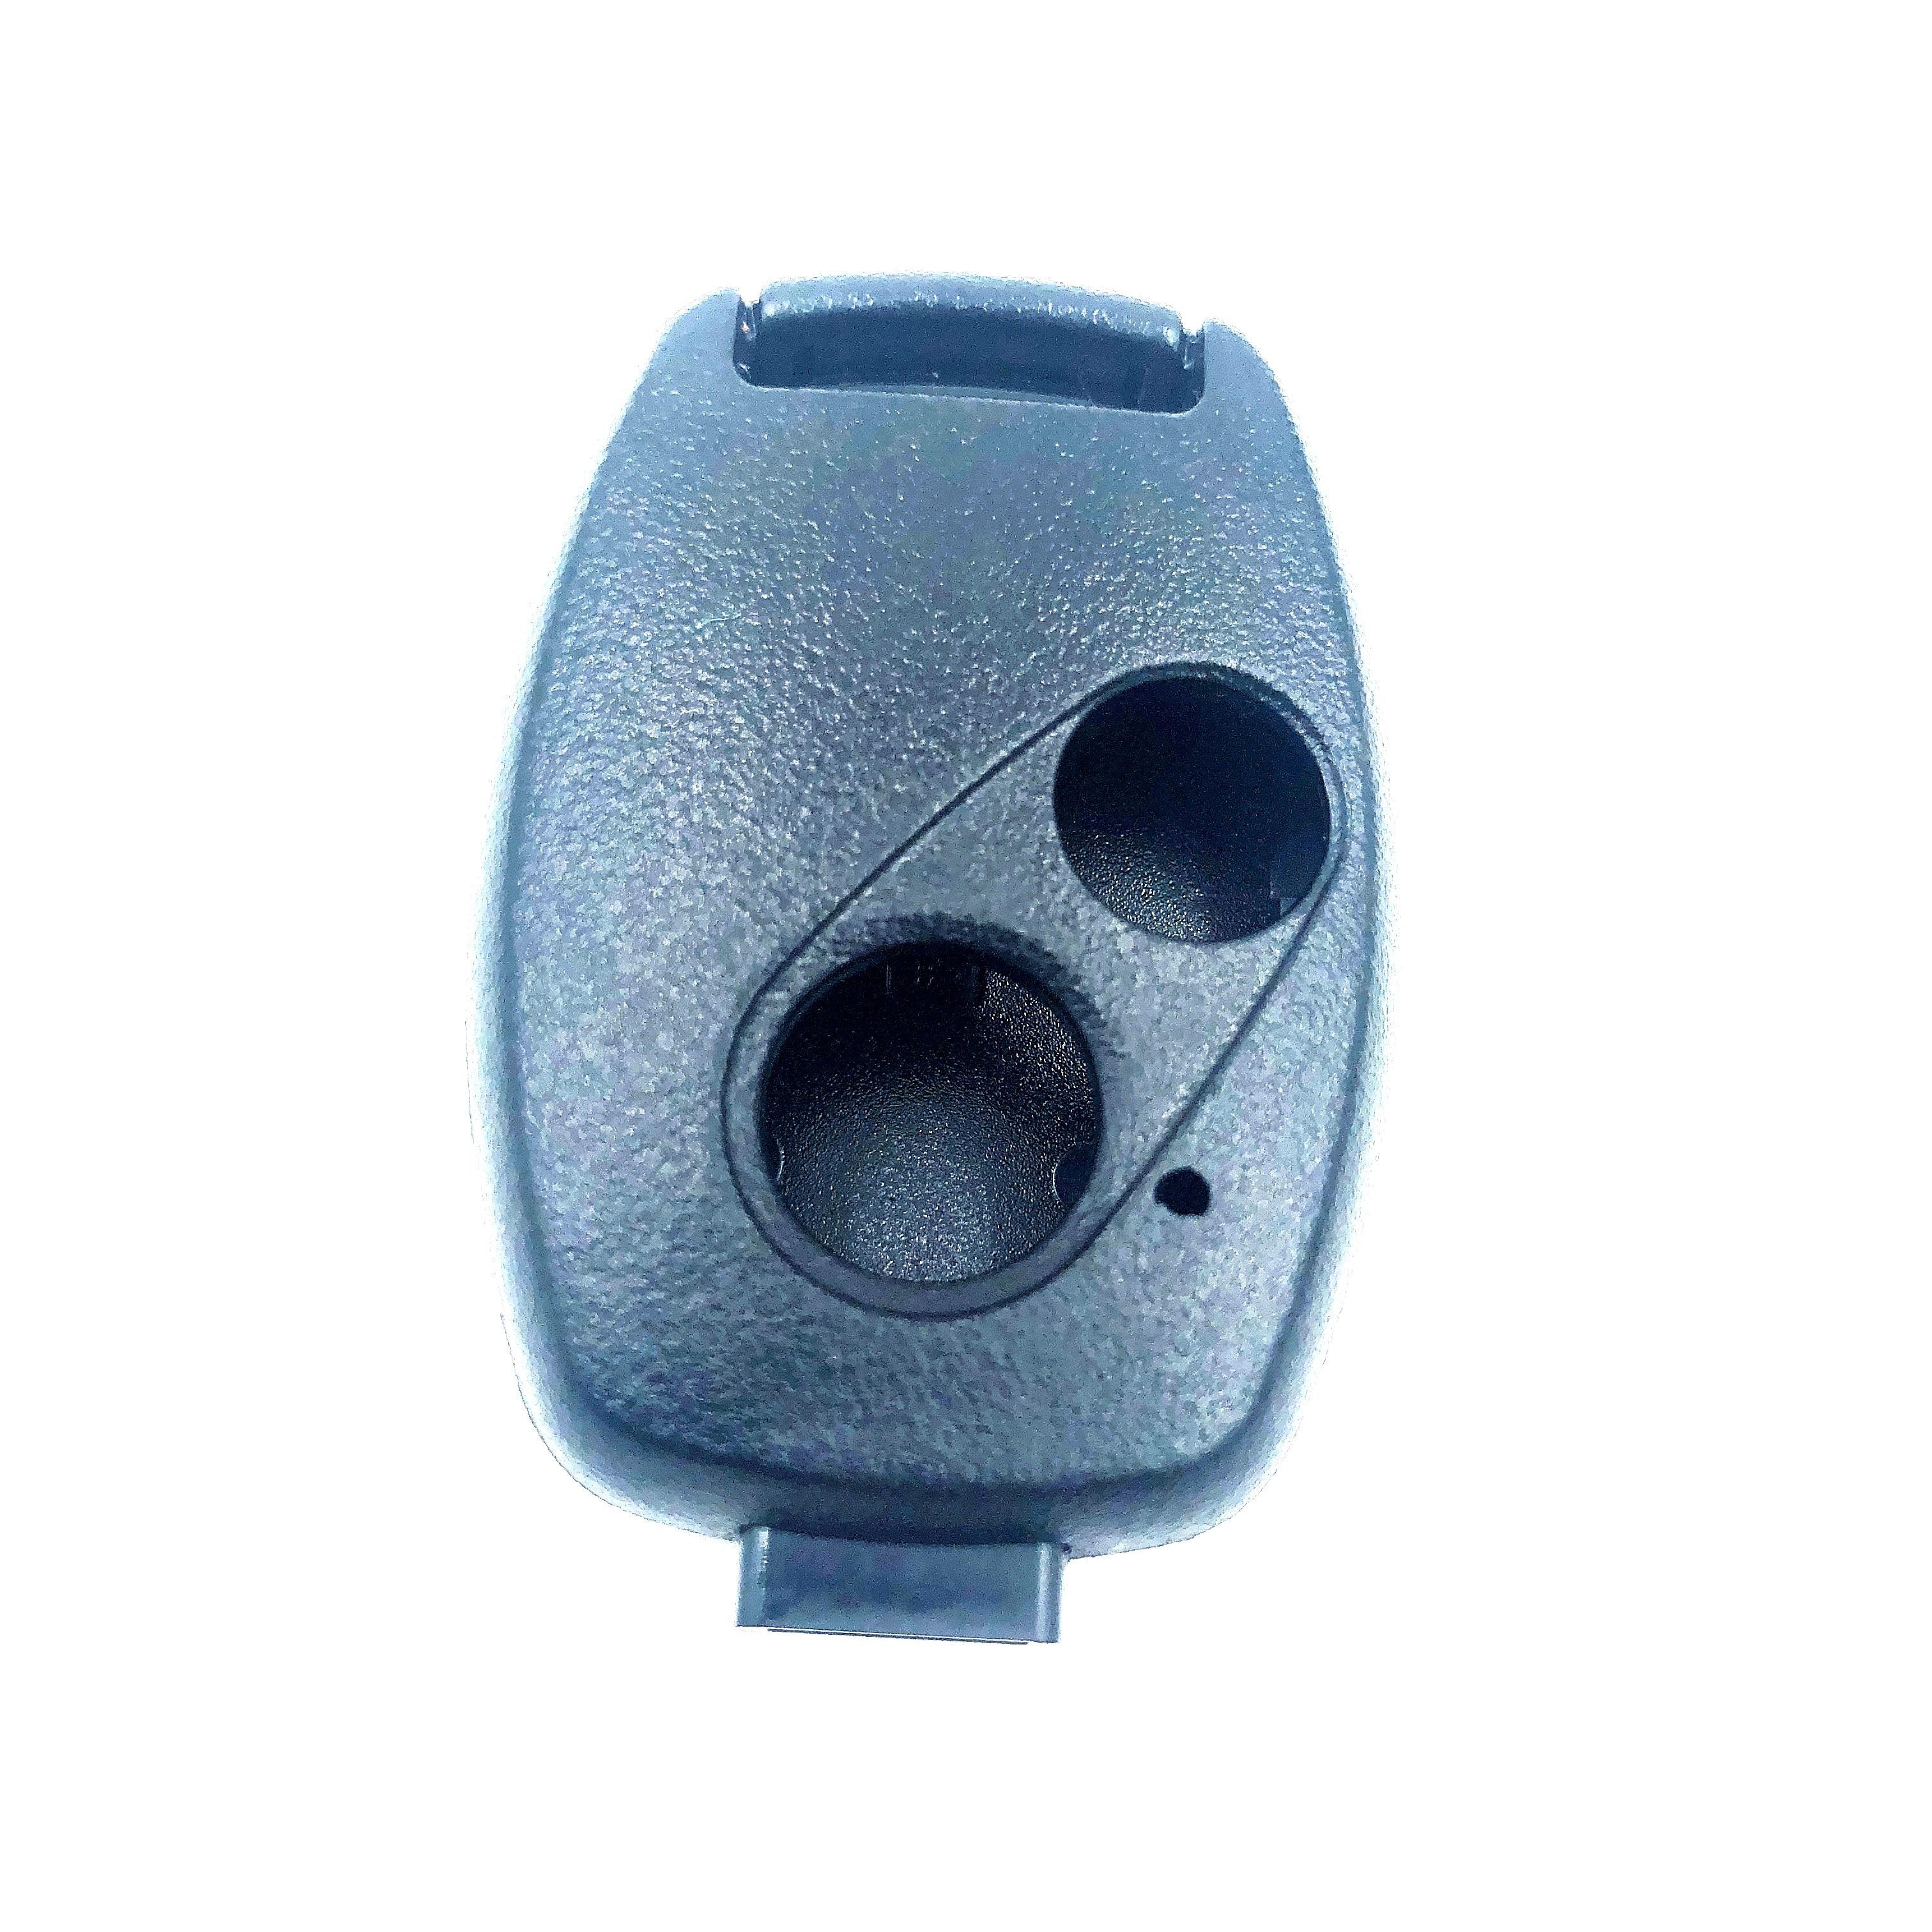 2 Button Car Remote Case Blank Key Fob for HONDA Accord Civic CRV HRV Jazz Pilot 2007 2008 2009 2010 2011 2012 2013 Key Shell